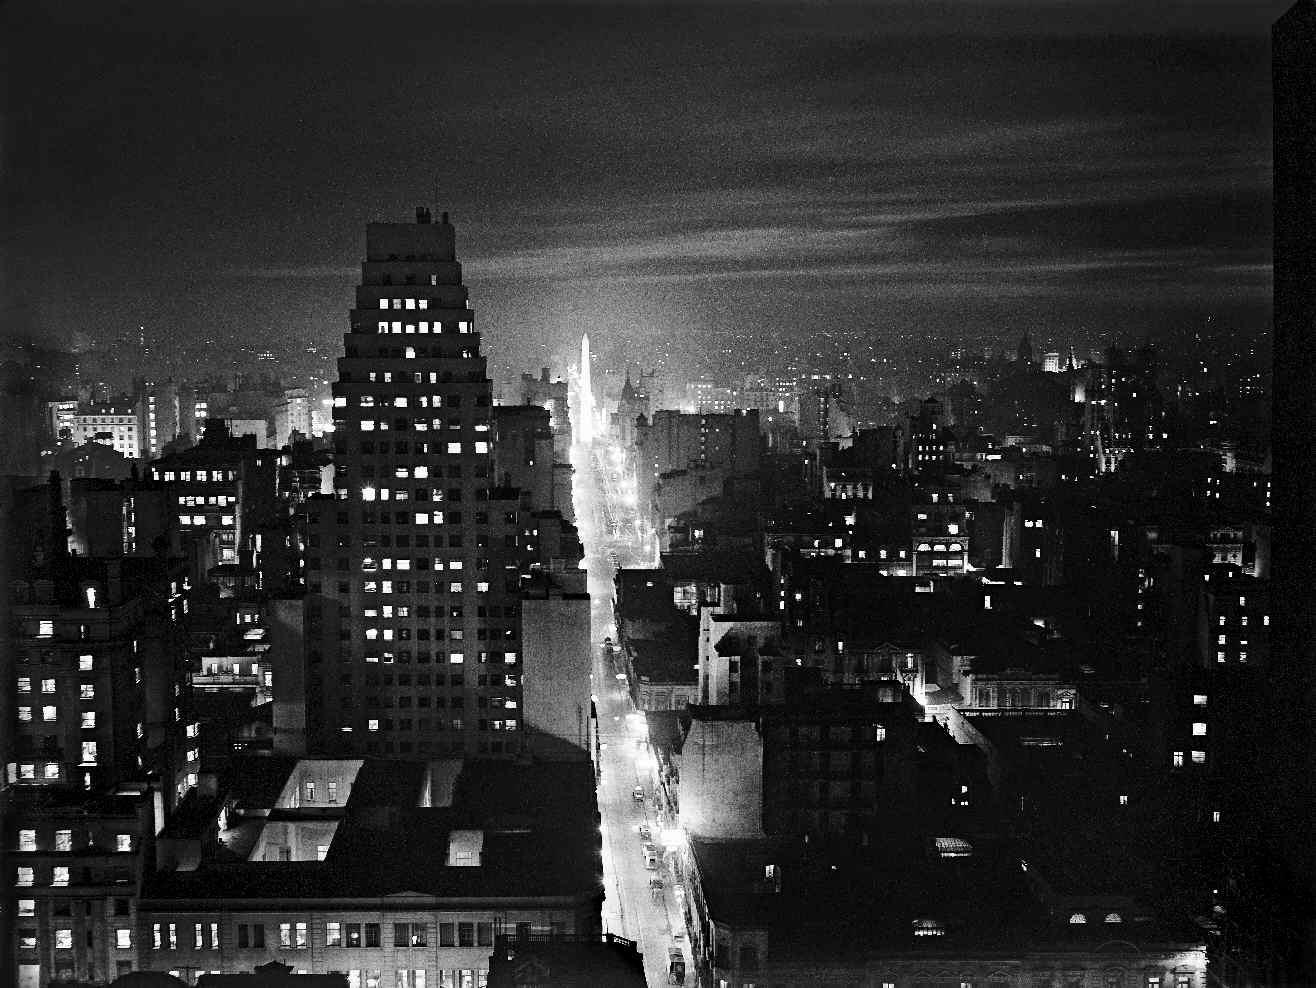 COPPOLA, Horacio, <i>Nocturno. Calle Corrientes desde Reconquista</i>